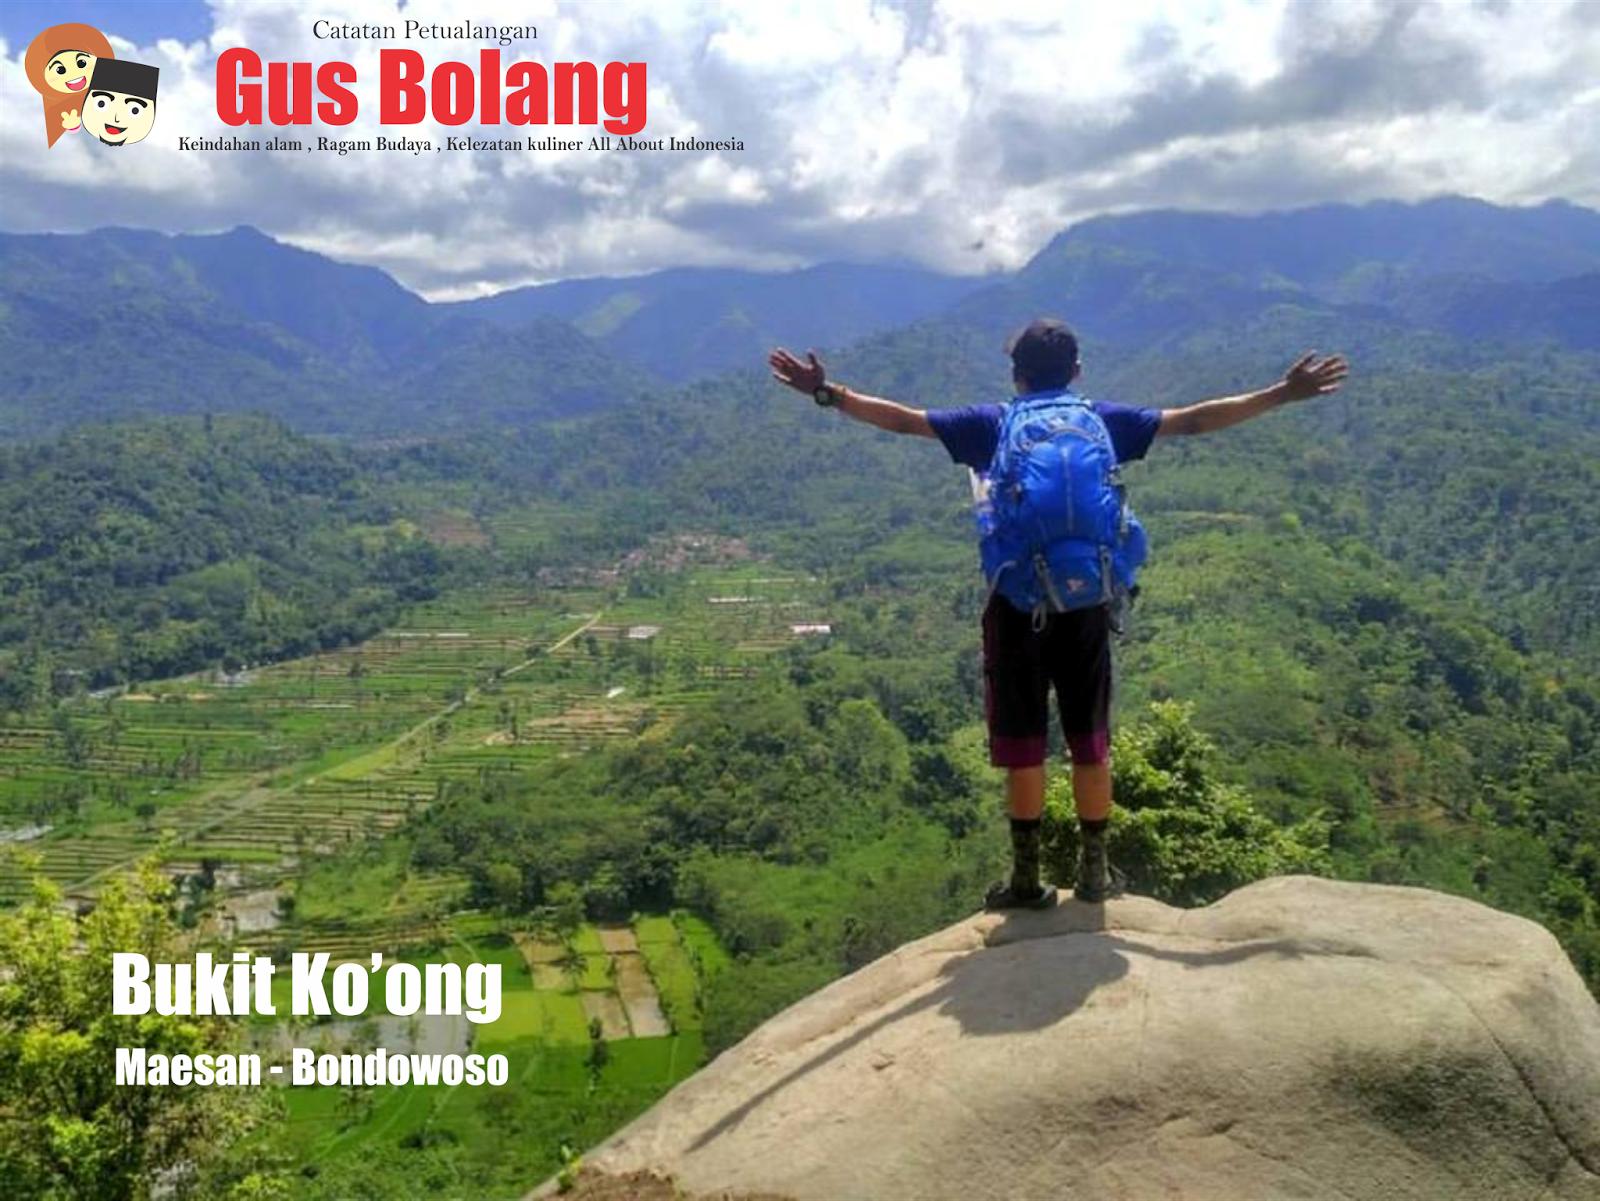 Pesona Keindahan Bukit Ko Ong Bondowoso Gus Bolang Foto Ociyd